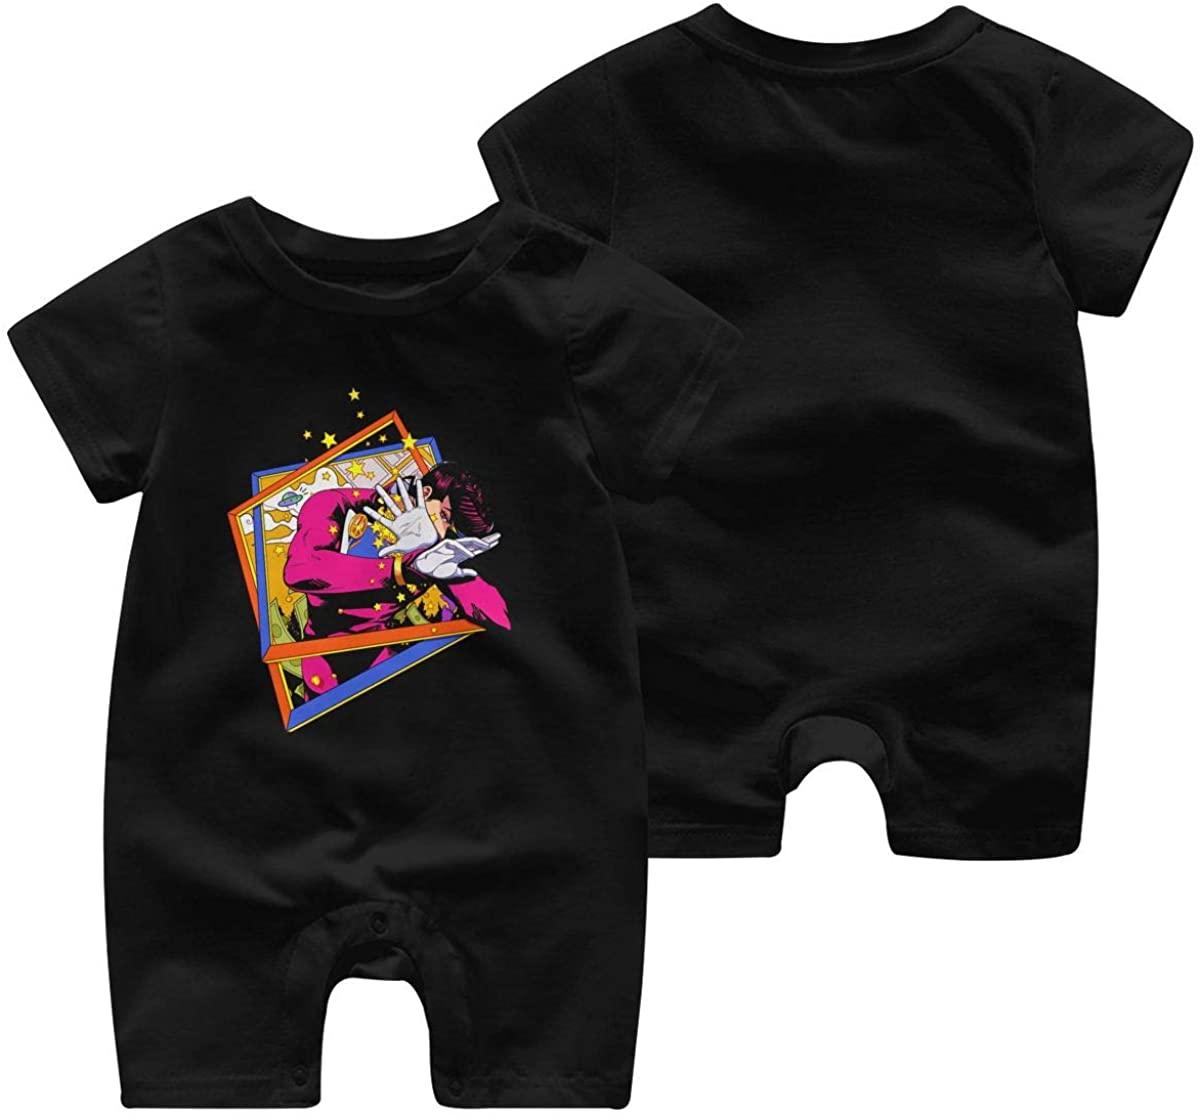 5husihai JoJos Bizarre Adventure 1-24 Months Boy Girl Baby Short Sleeve Creeper Jumpsuit Black